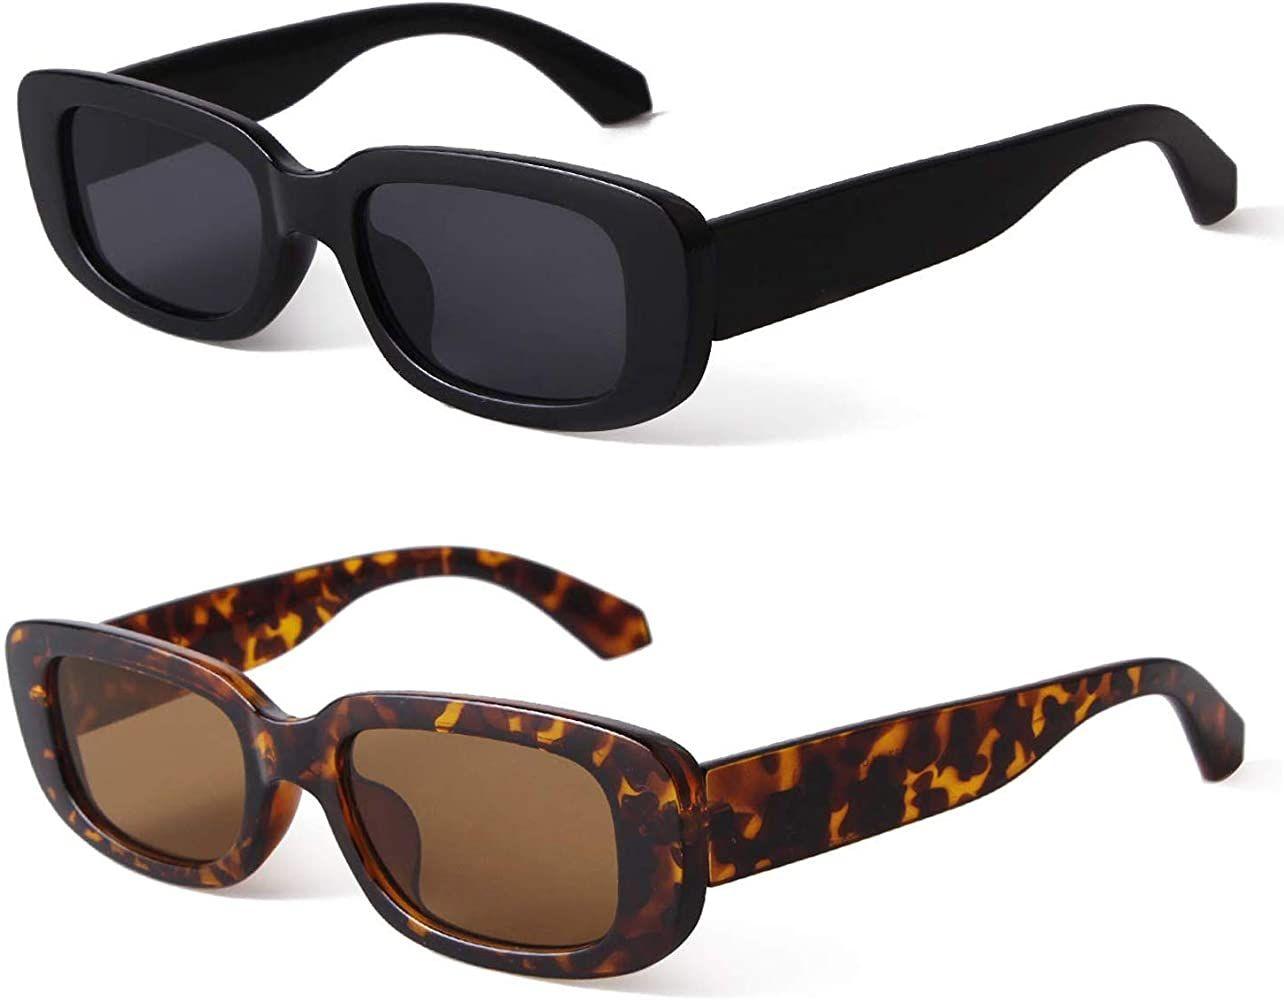 Amazon Com Butaby Rectangle Sunglasses For Women Retro Driving Glasses 90 S Vintage Fashion Narrow Squar Rectangle Sunglasses Retro Sunglasses Glasses Fashion